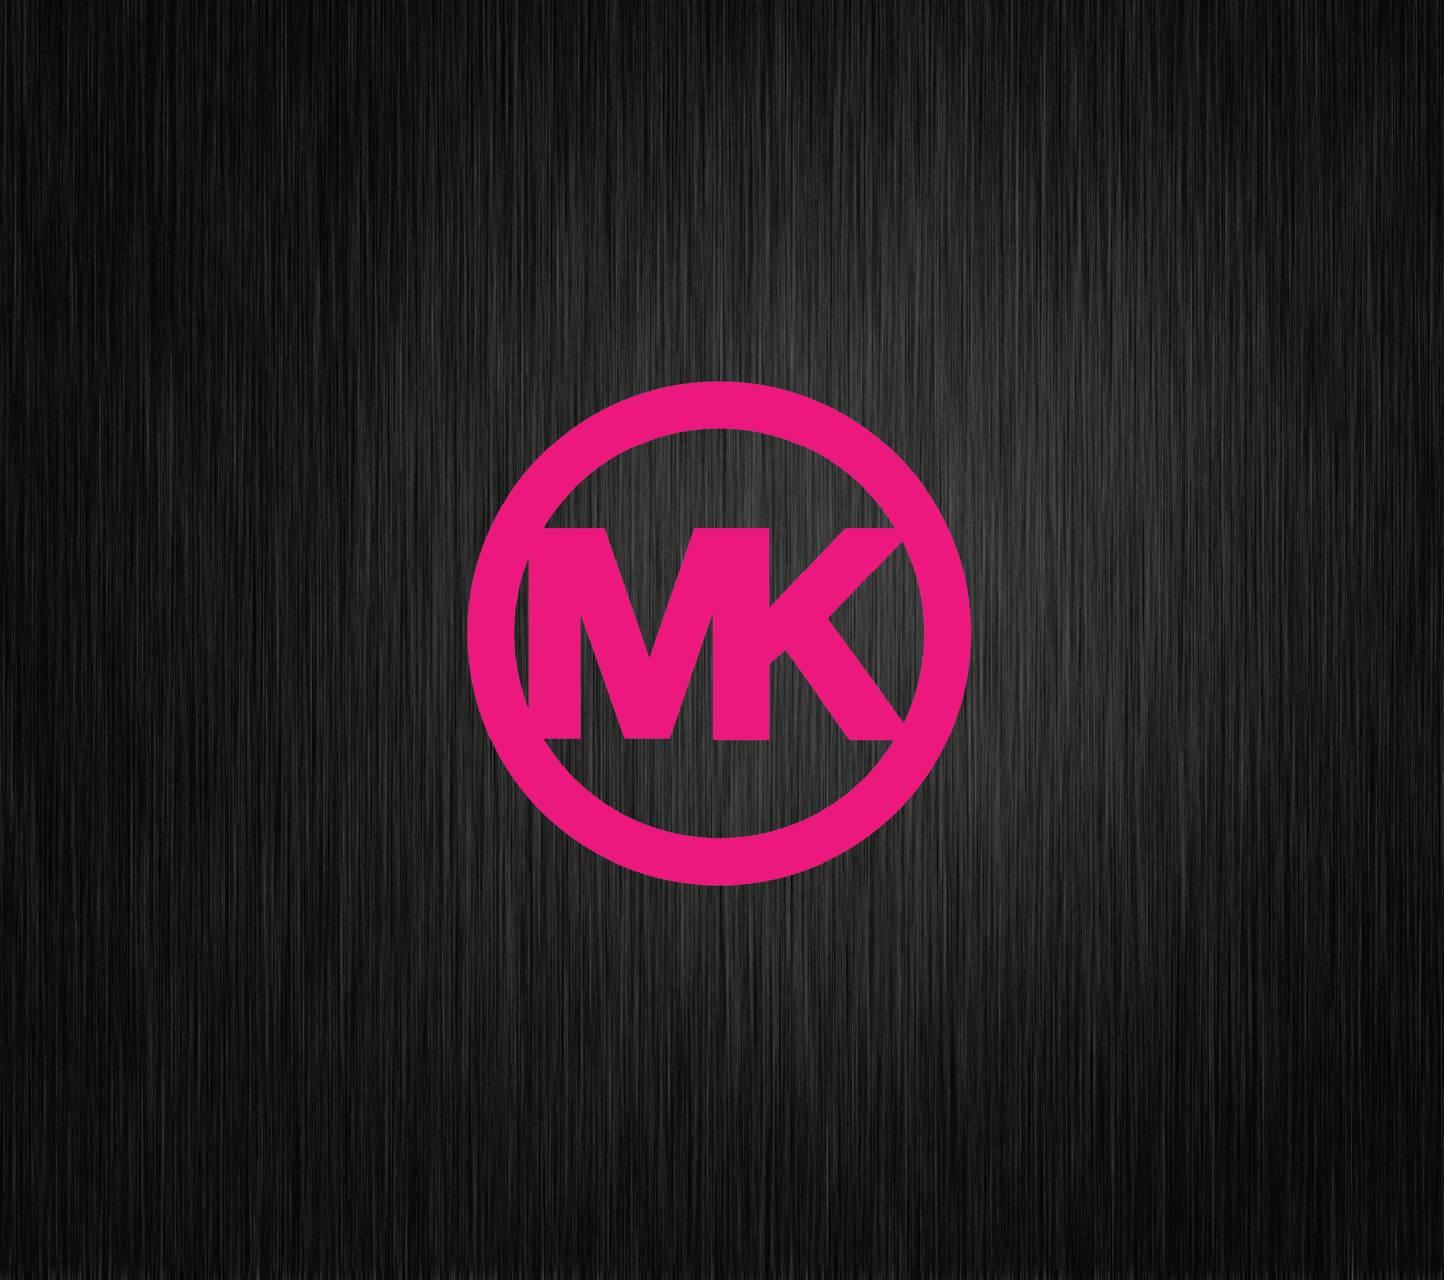 Michael Kors Logo Wallpaper by jamesluce2 - 98 - Free on ...